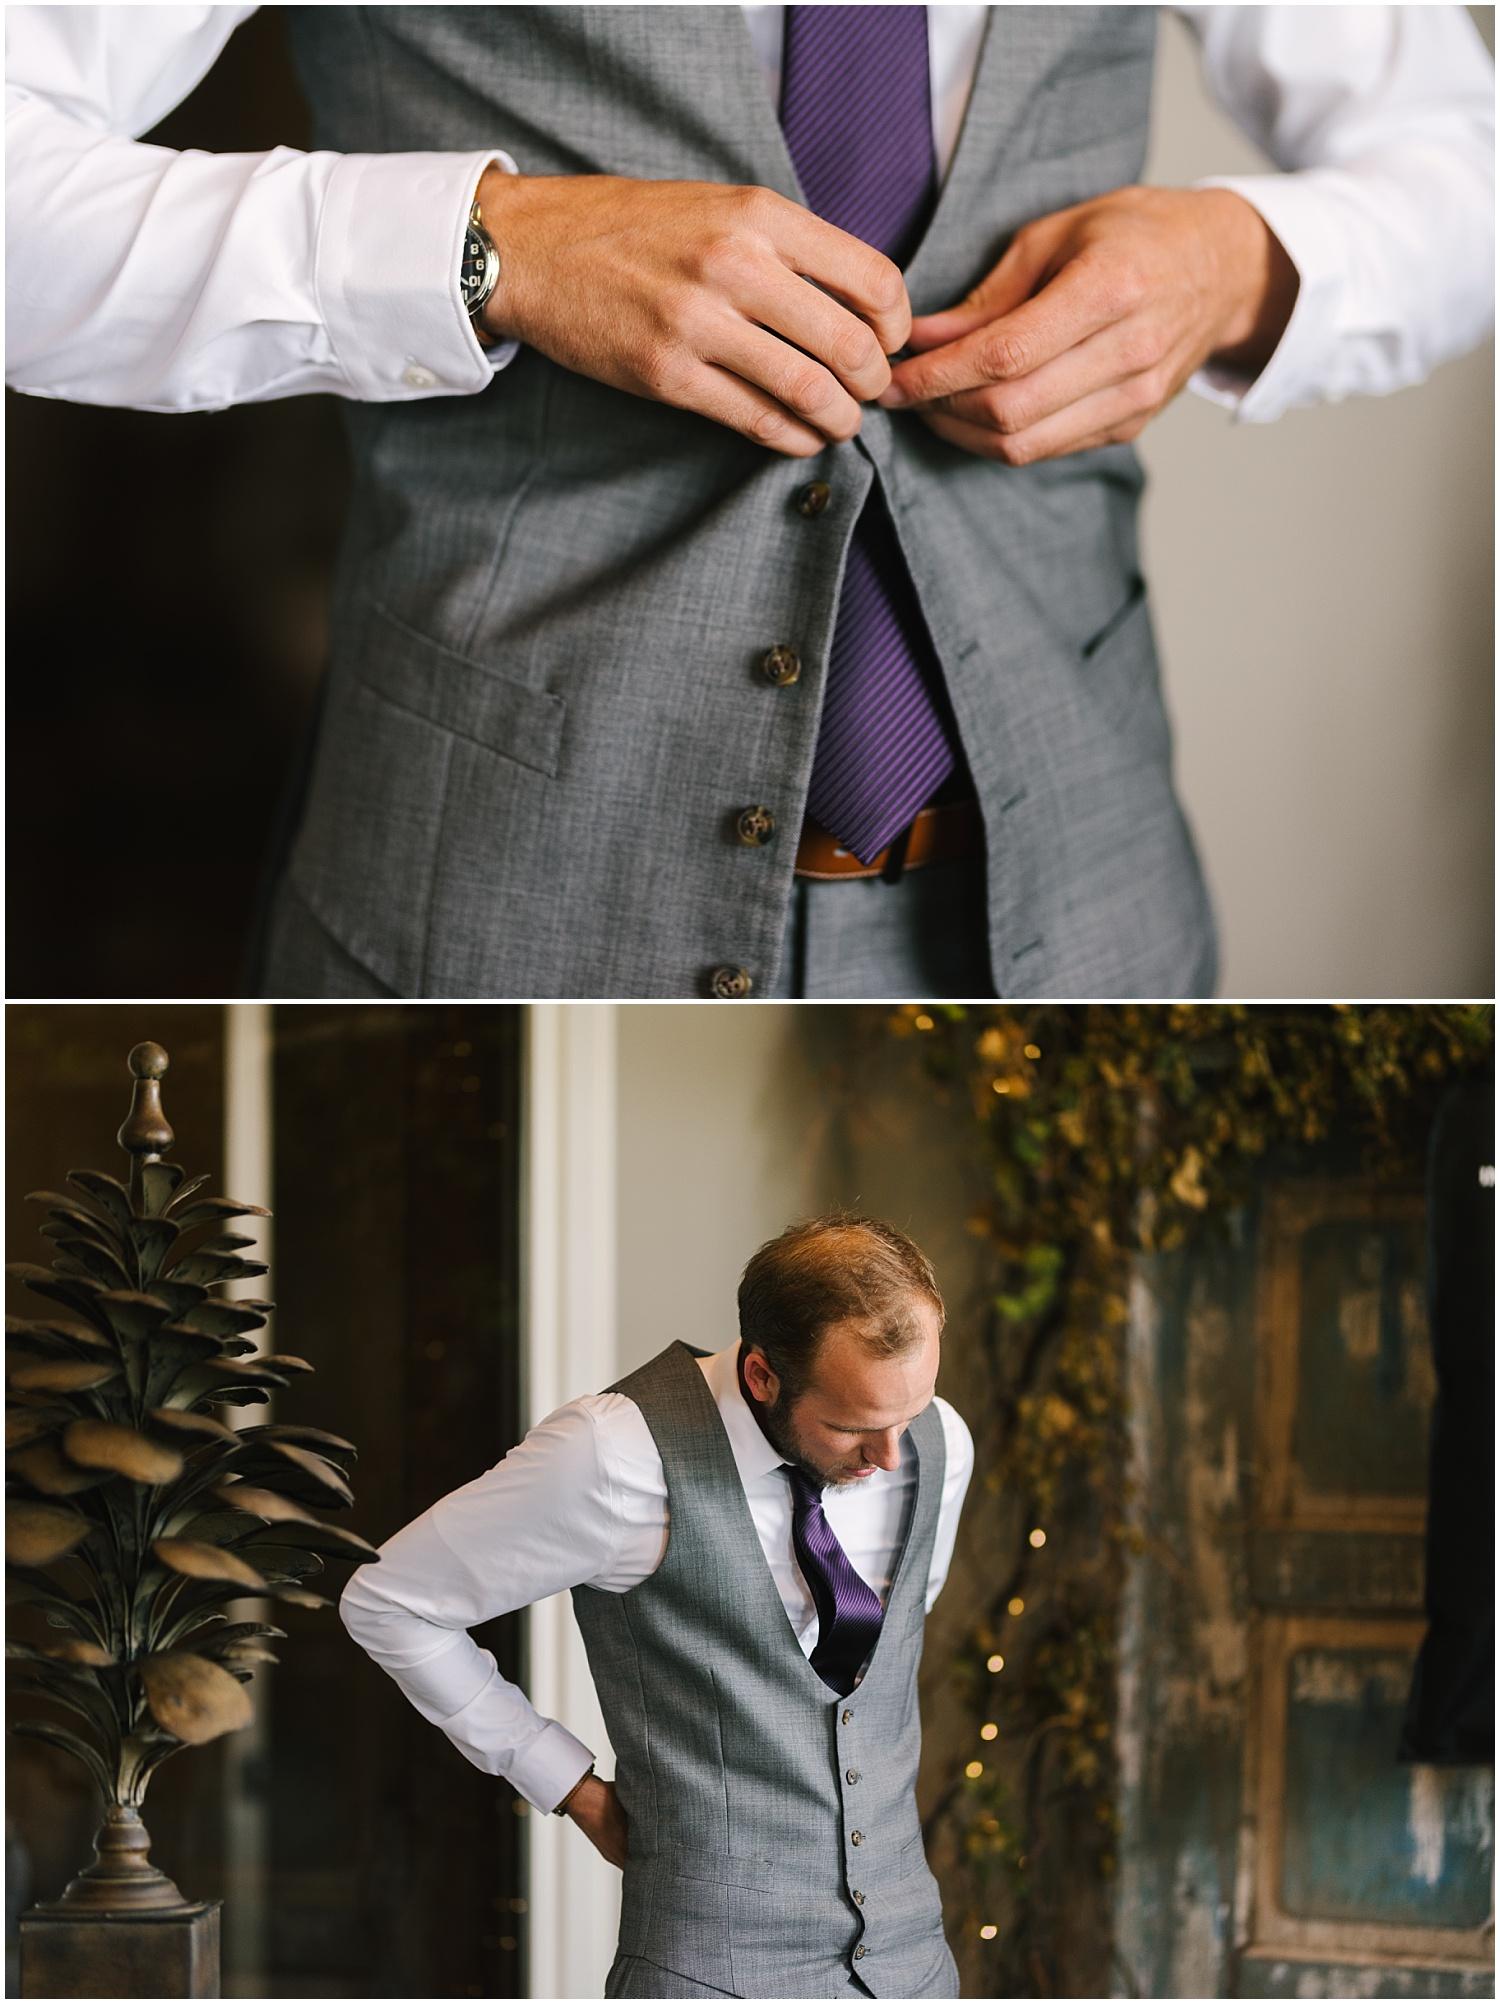 deerfield+country+club+wedding+rochester+NY+photographer (9).jpg